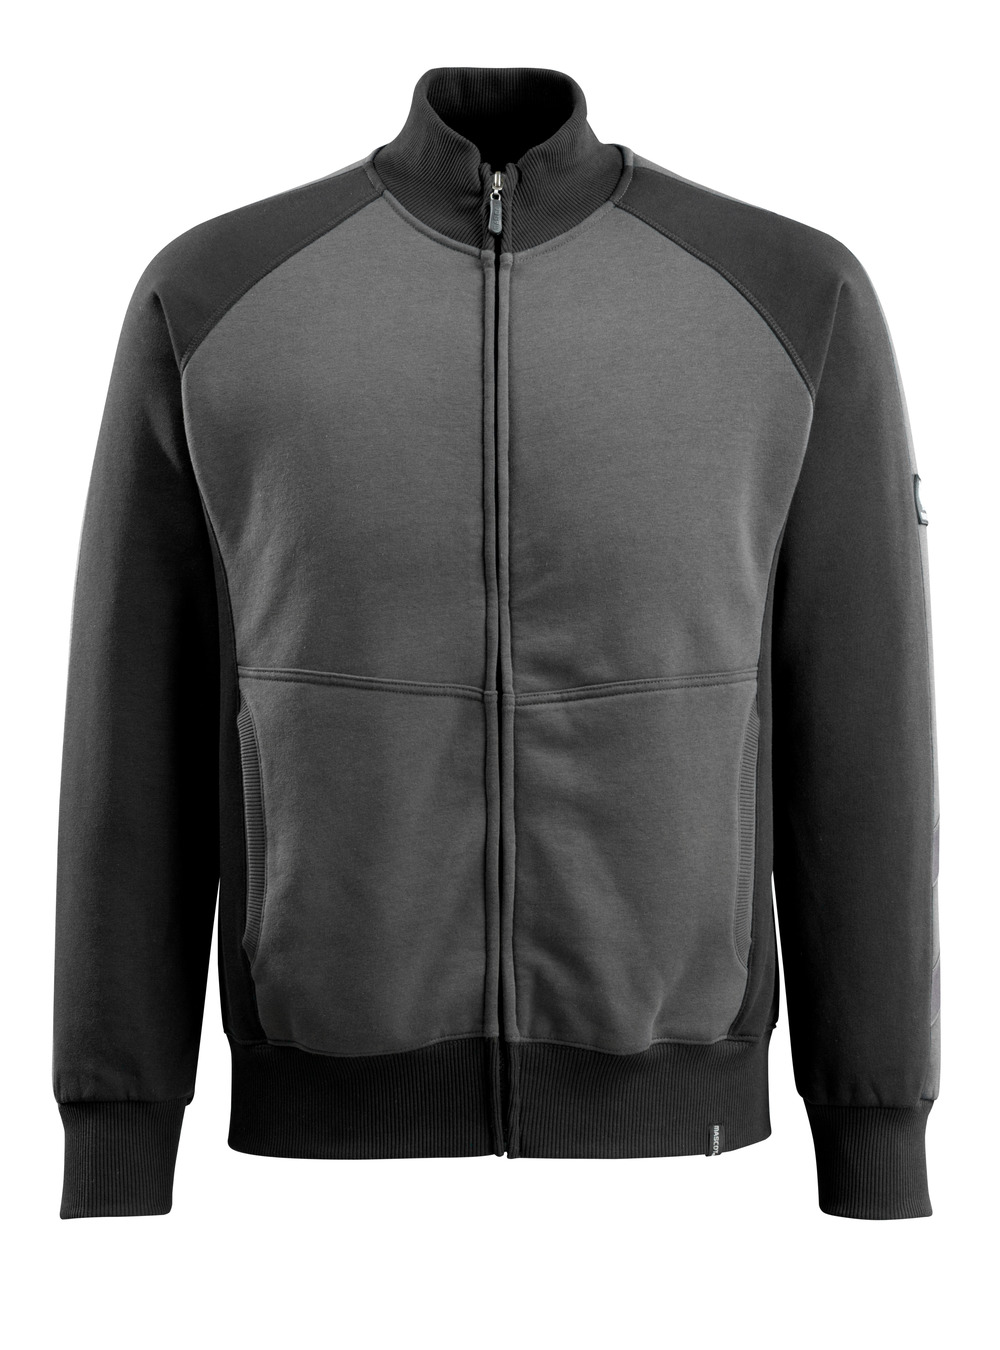 50565-963-1809 Sweatshirt med lynlås - mørk antracit/sort